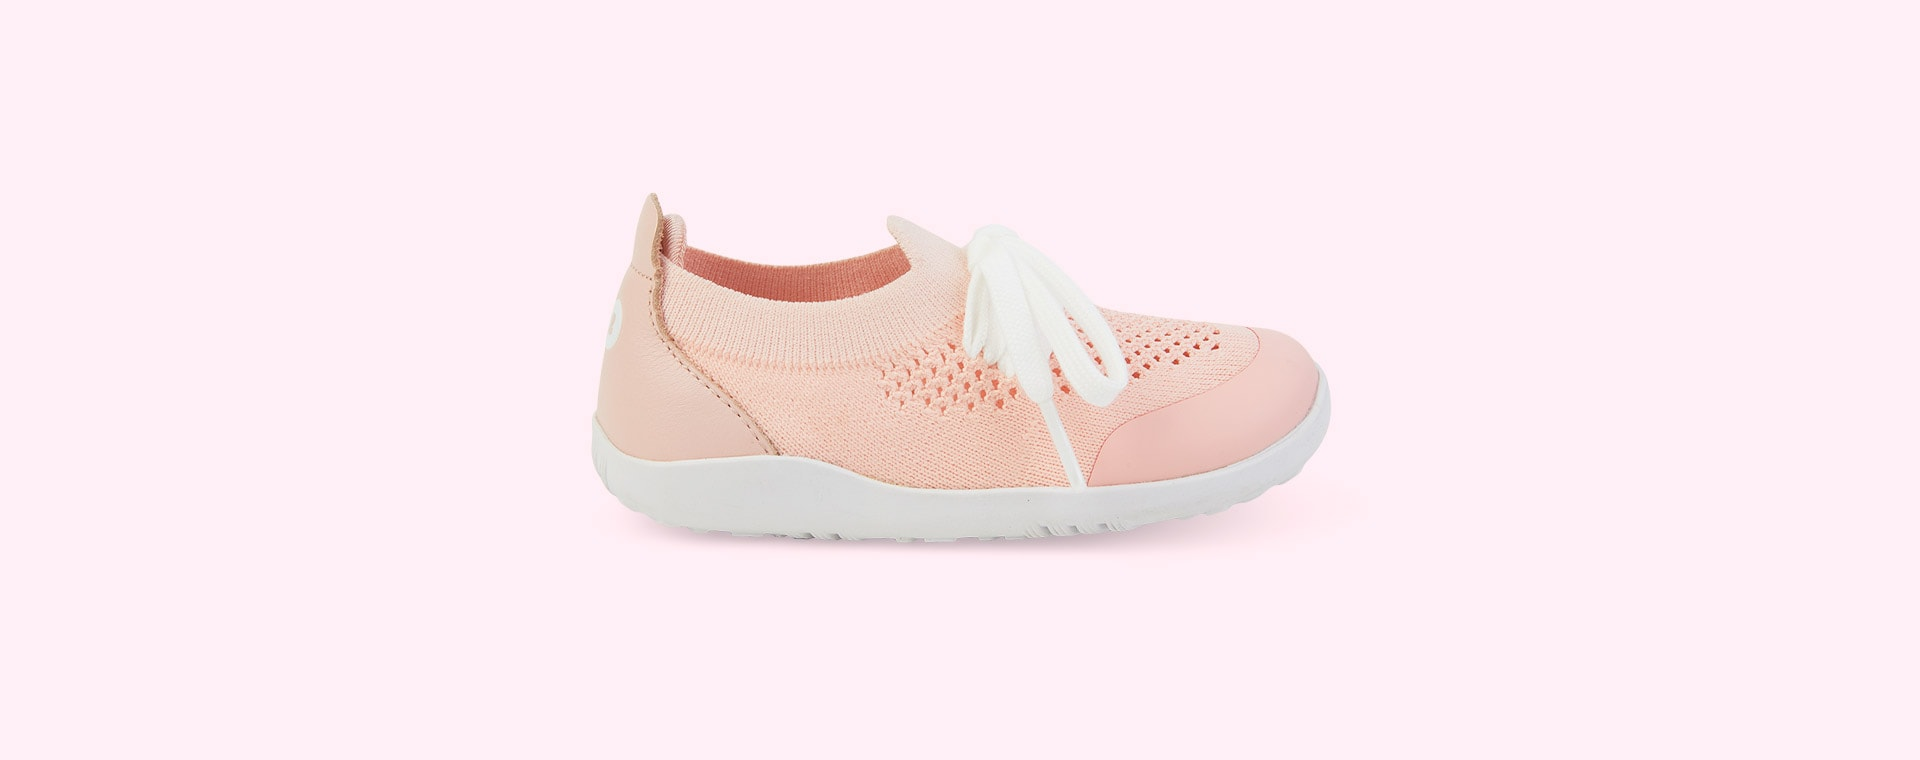 Blossom Bobux I Walk Play Knit Trainer